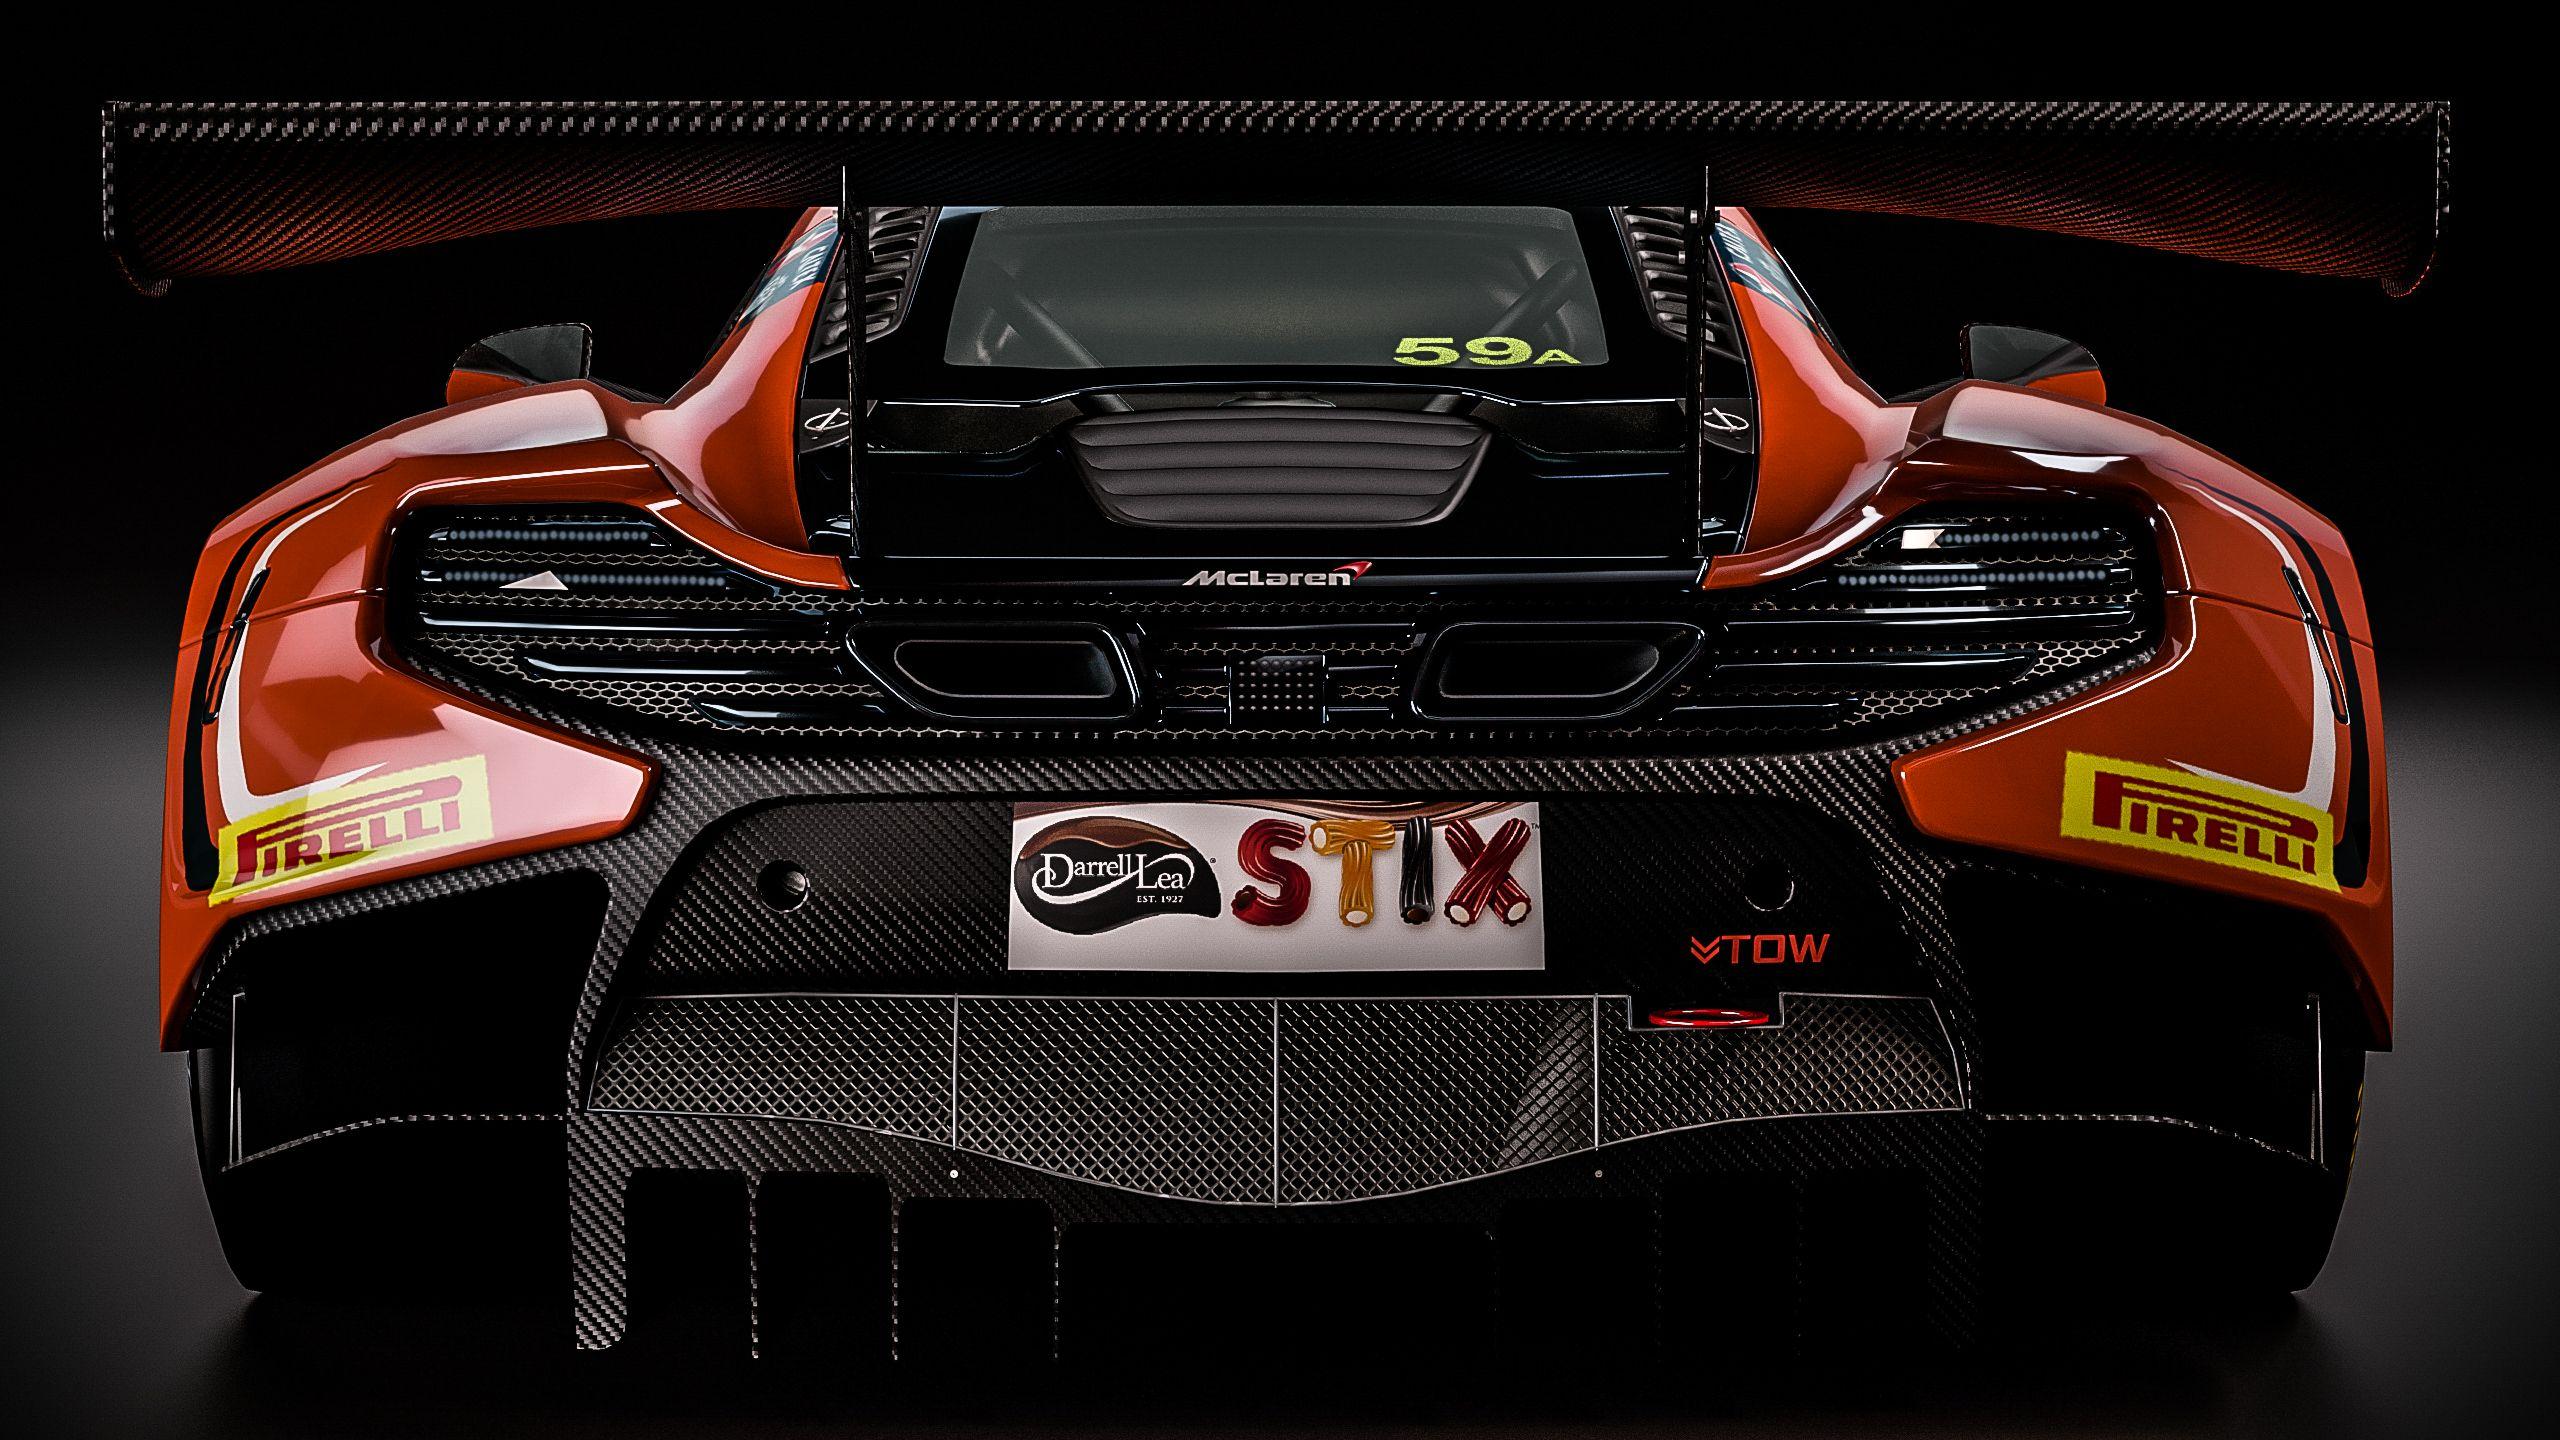 Mclaren 650s Gt3 Mclaren Gt Tekno Autosports By Nancorocks